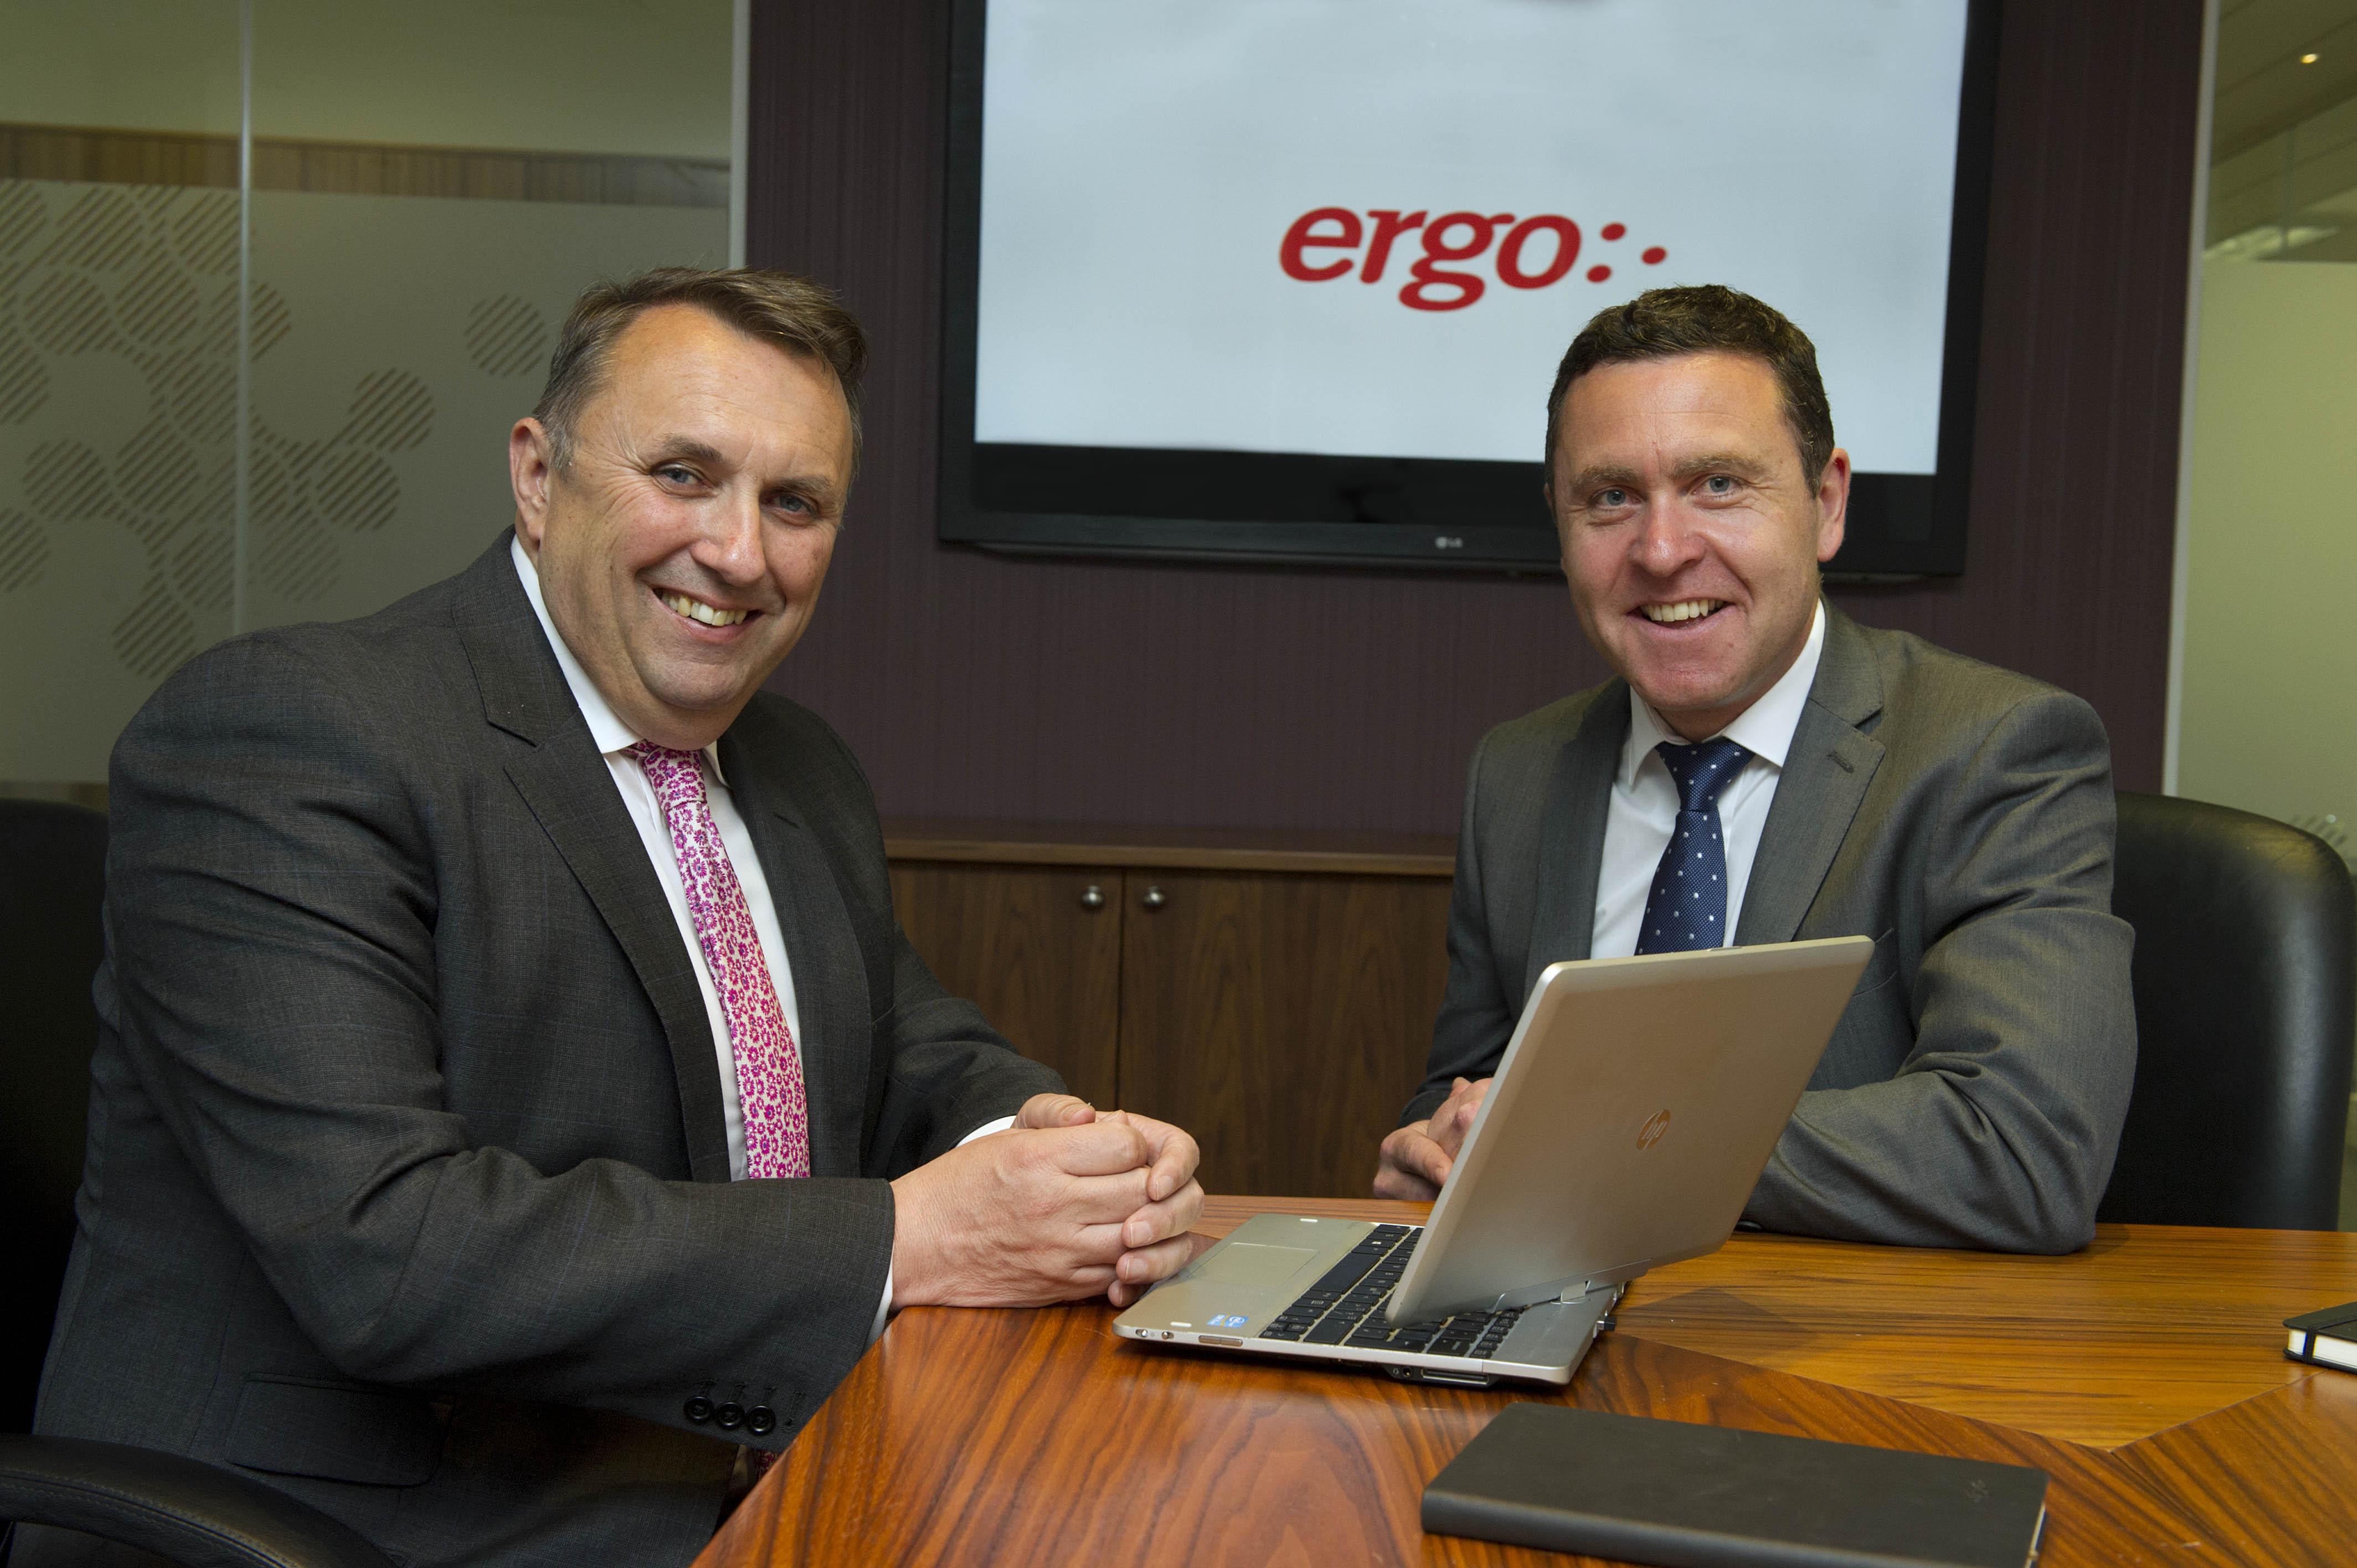 Ergo Announces Creation of 120 Jobs